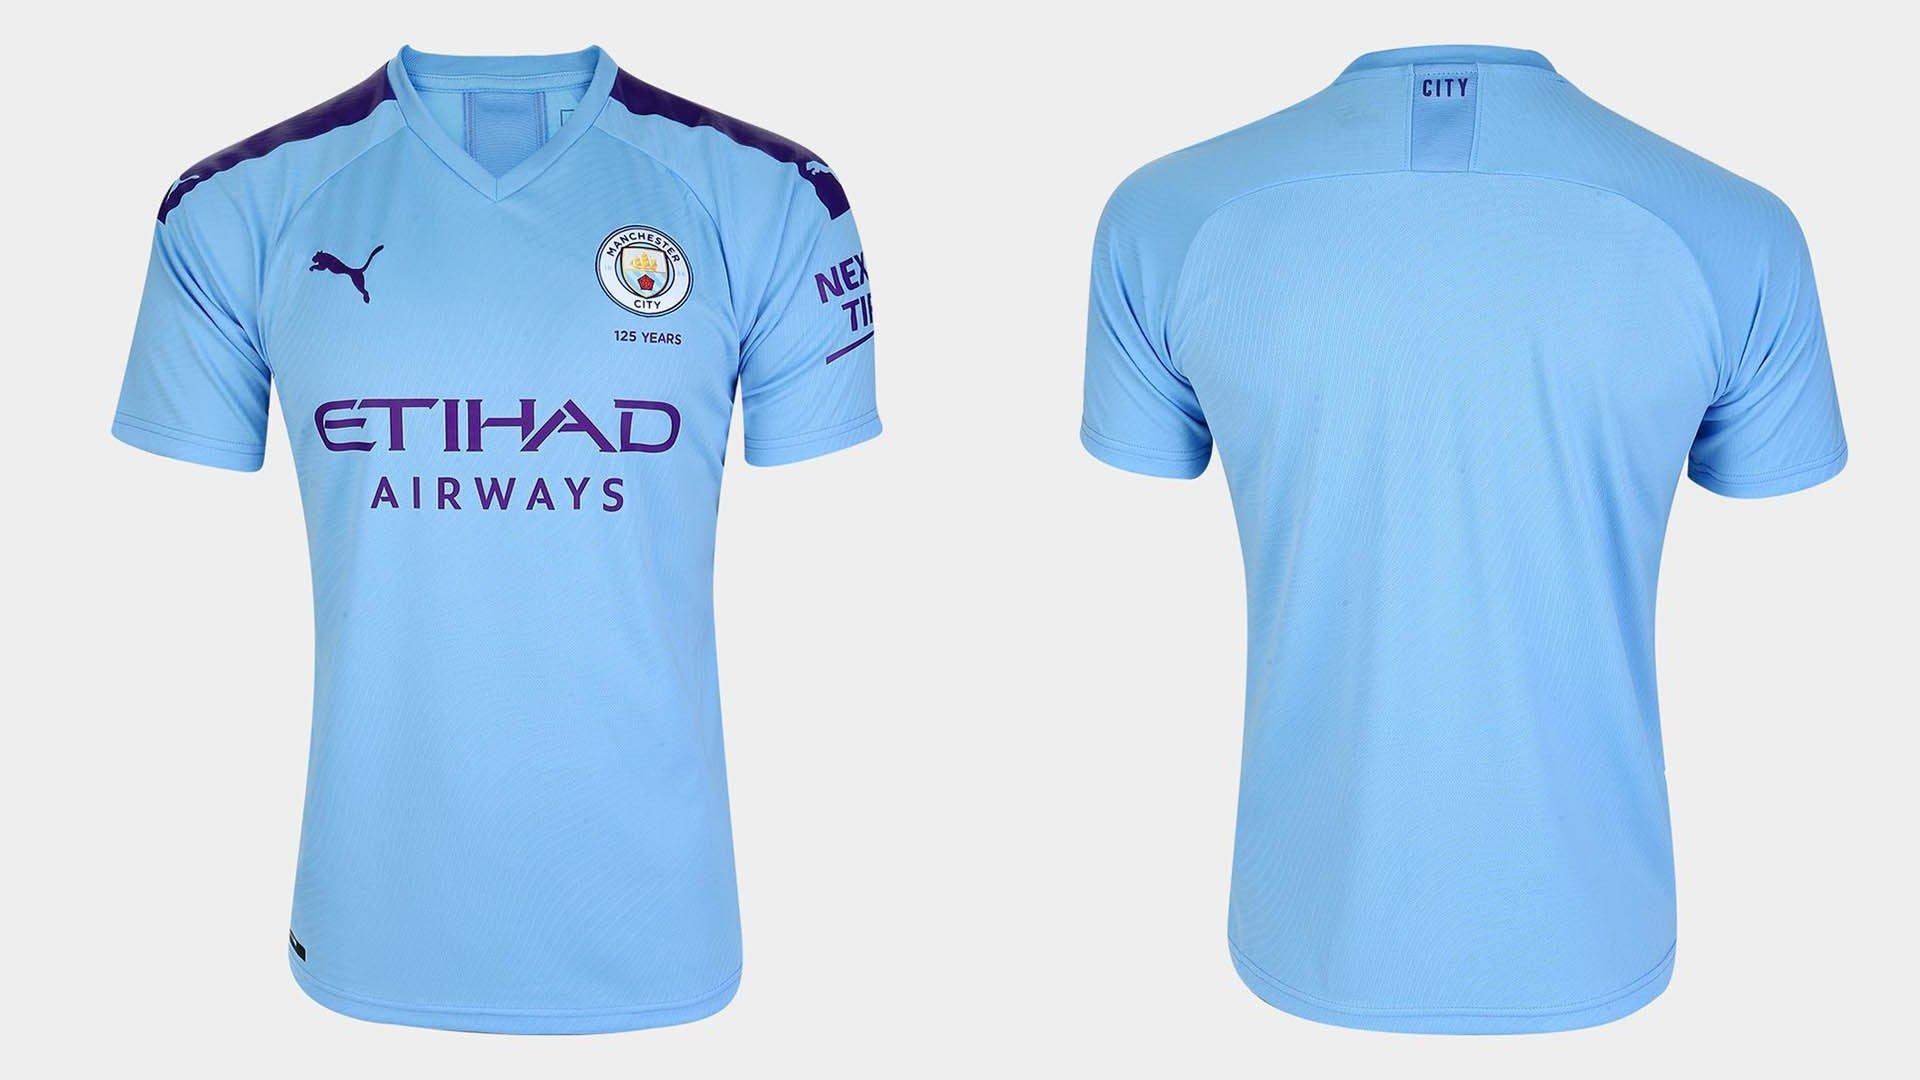 uniforme titular manchester city 2019 20